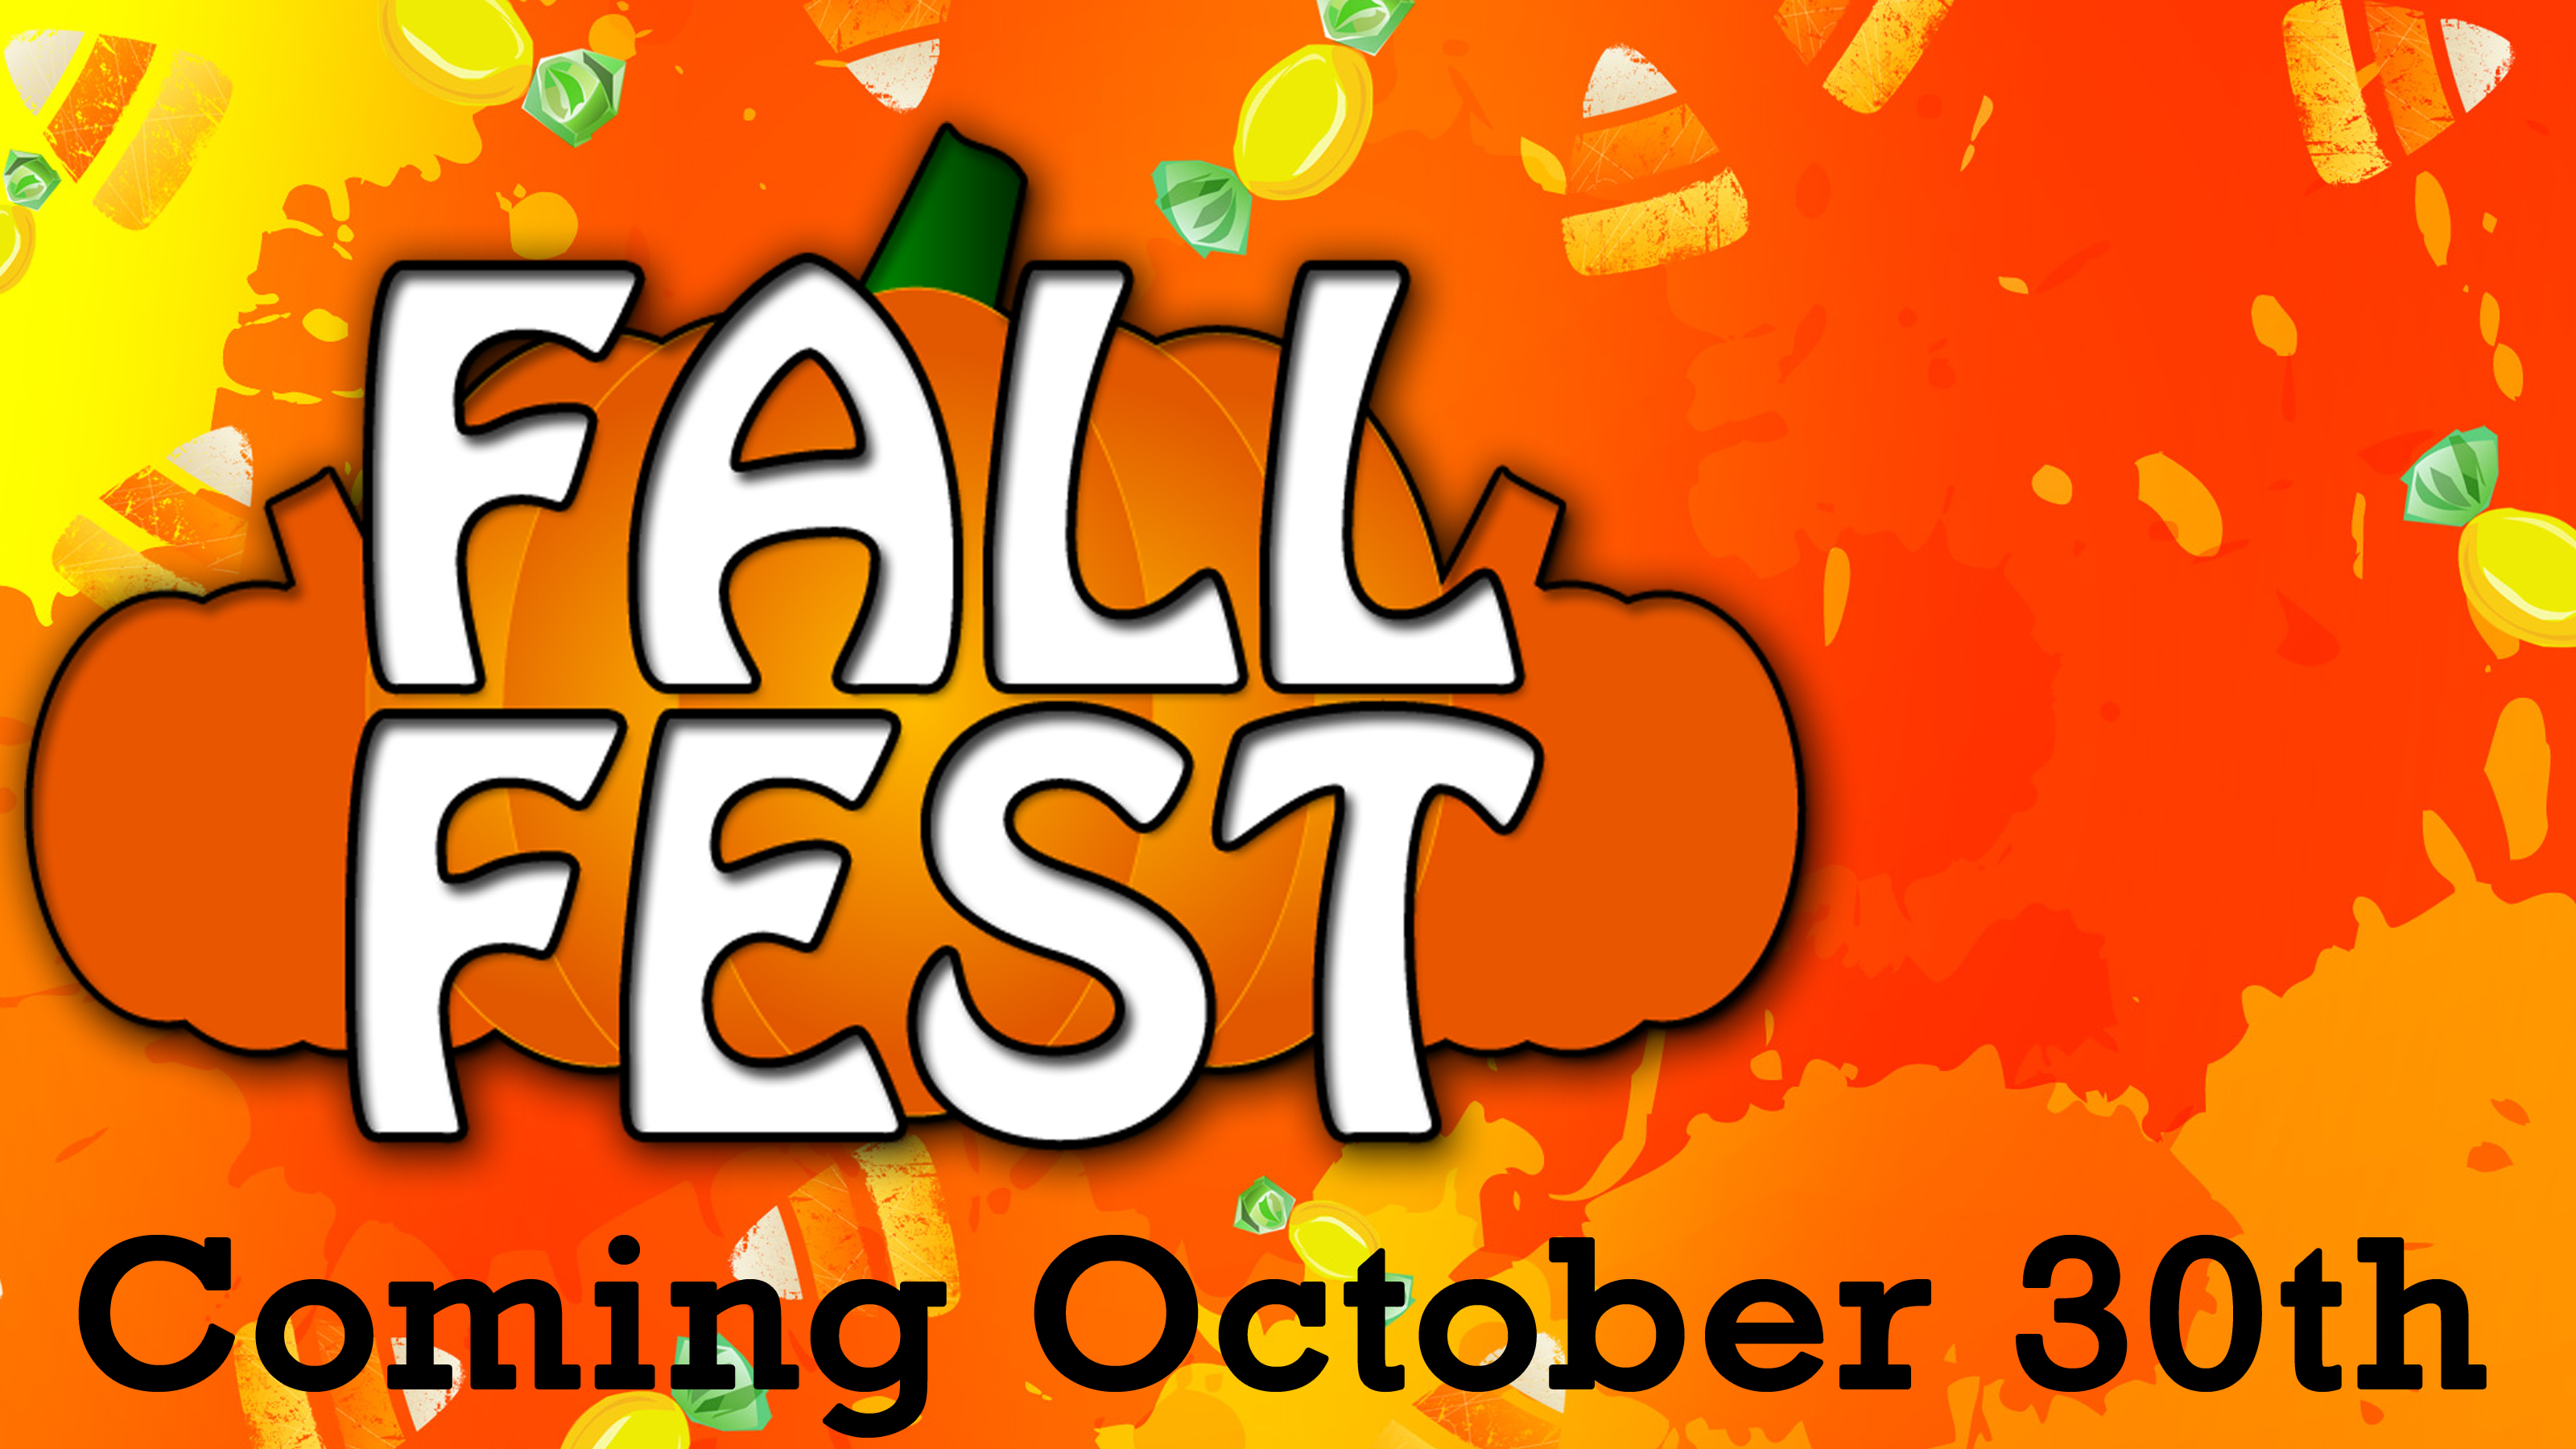 Tease- Fall Fest 2013